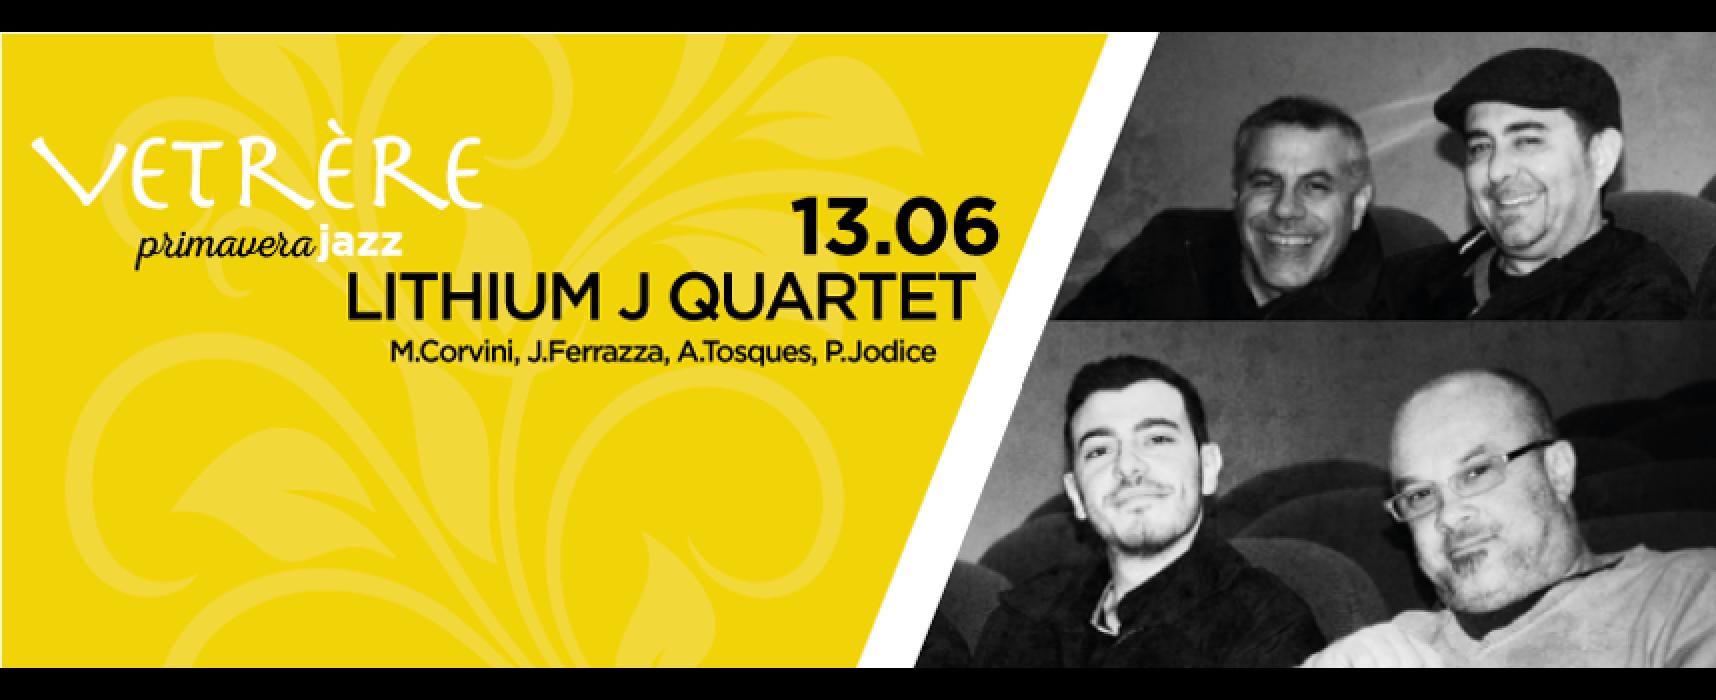 Vetrère Primavera Jazz, Lithium J Quartet a Palazzo Ammazzalorsa / PROGRAMMA